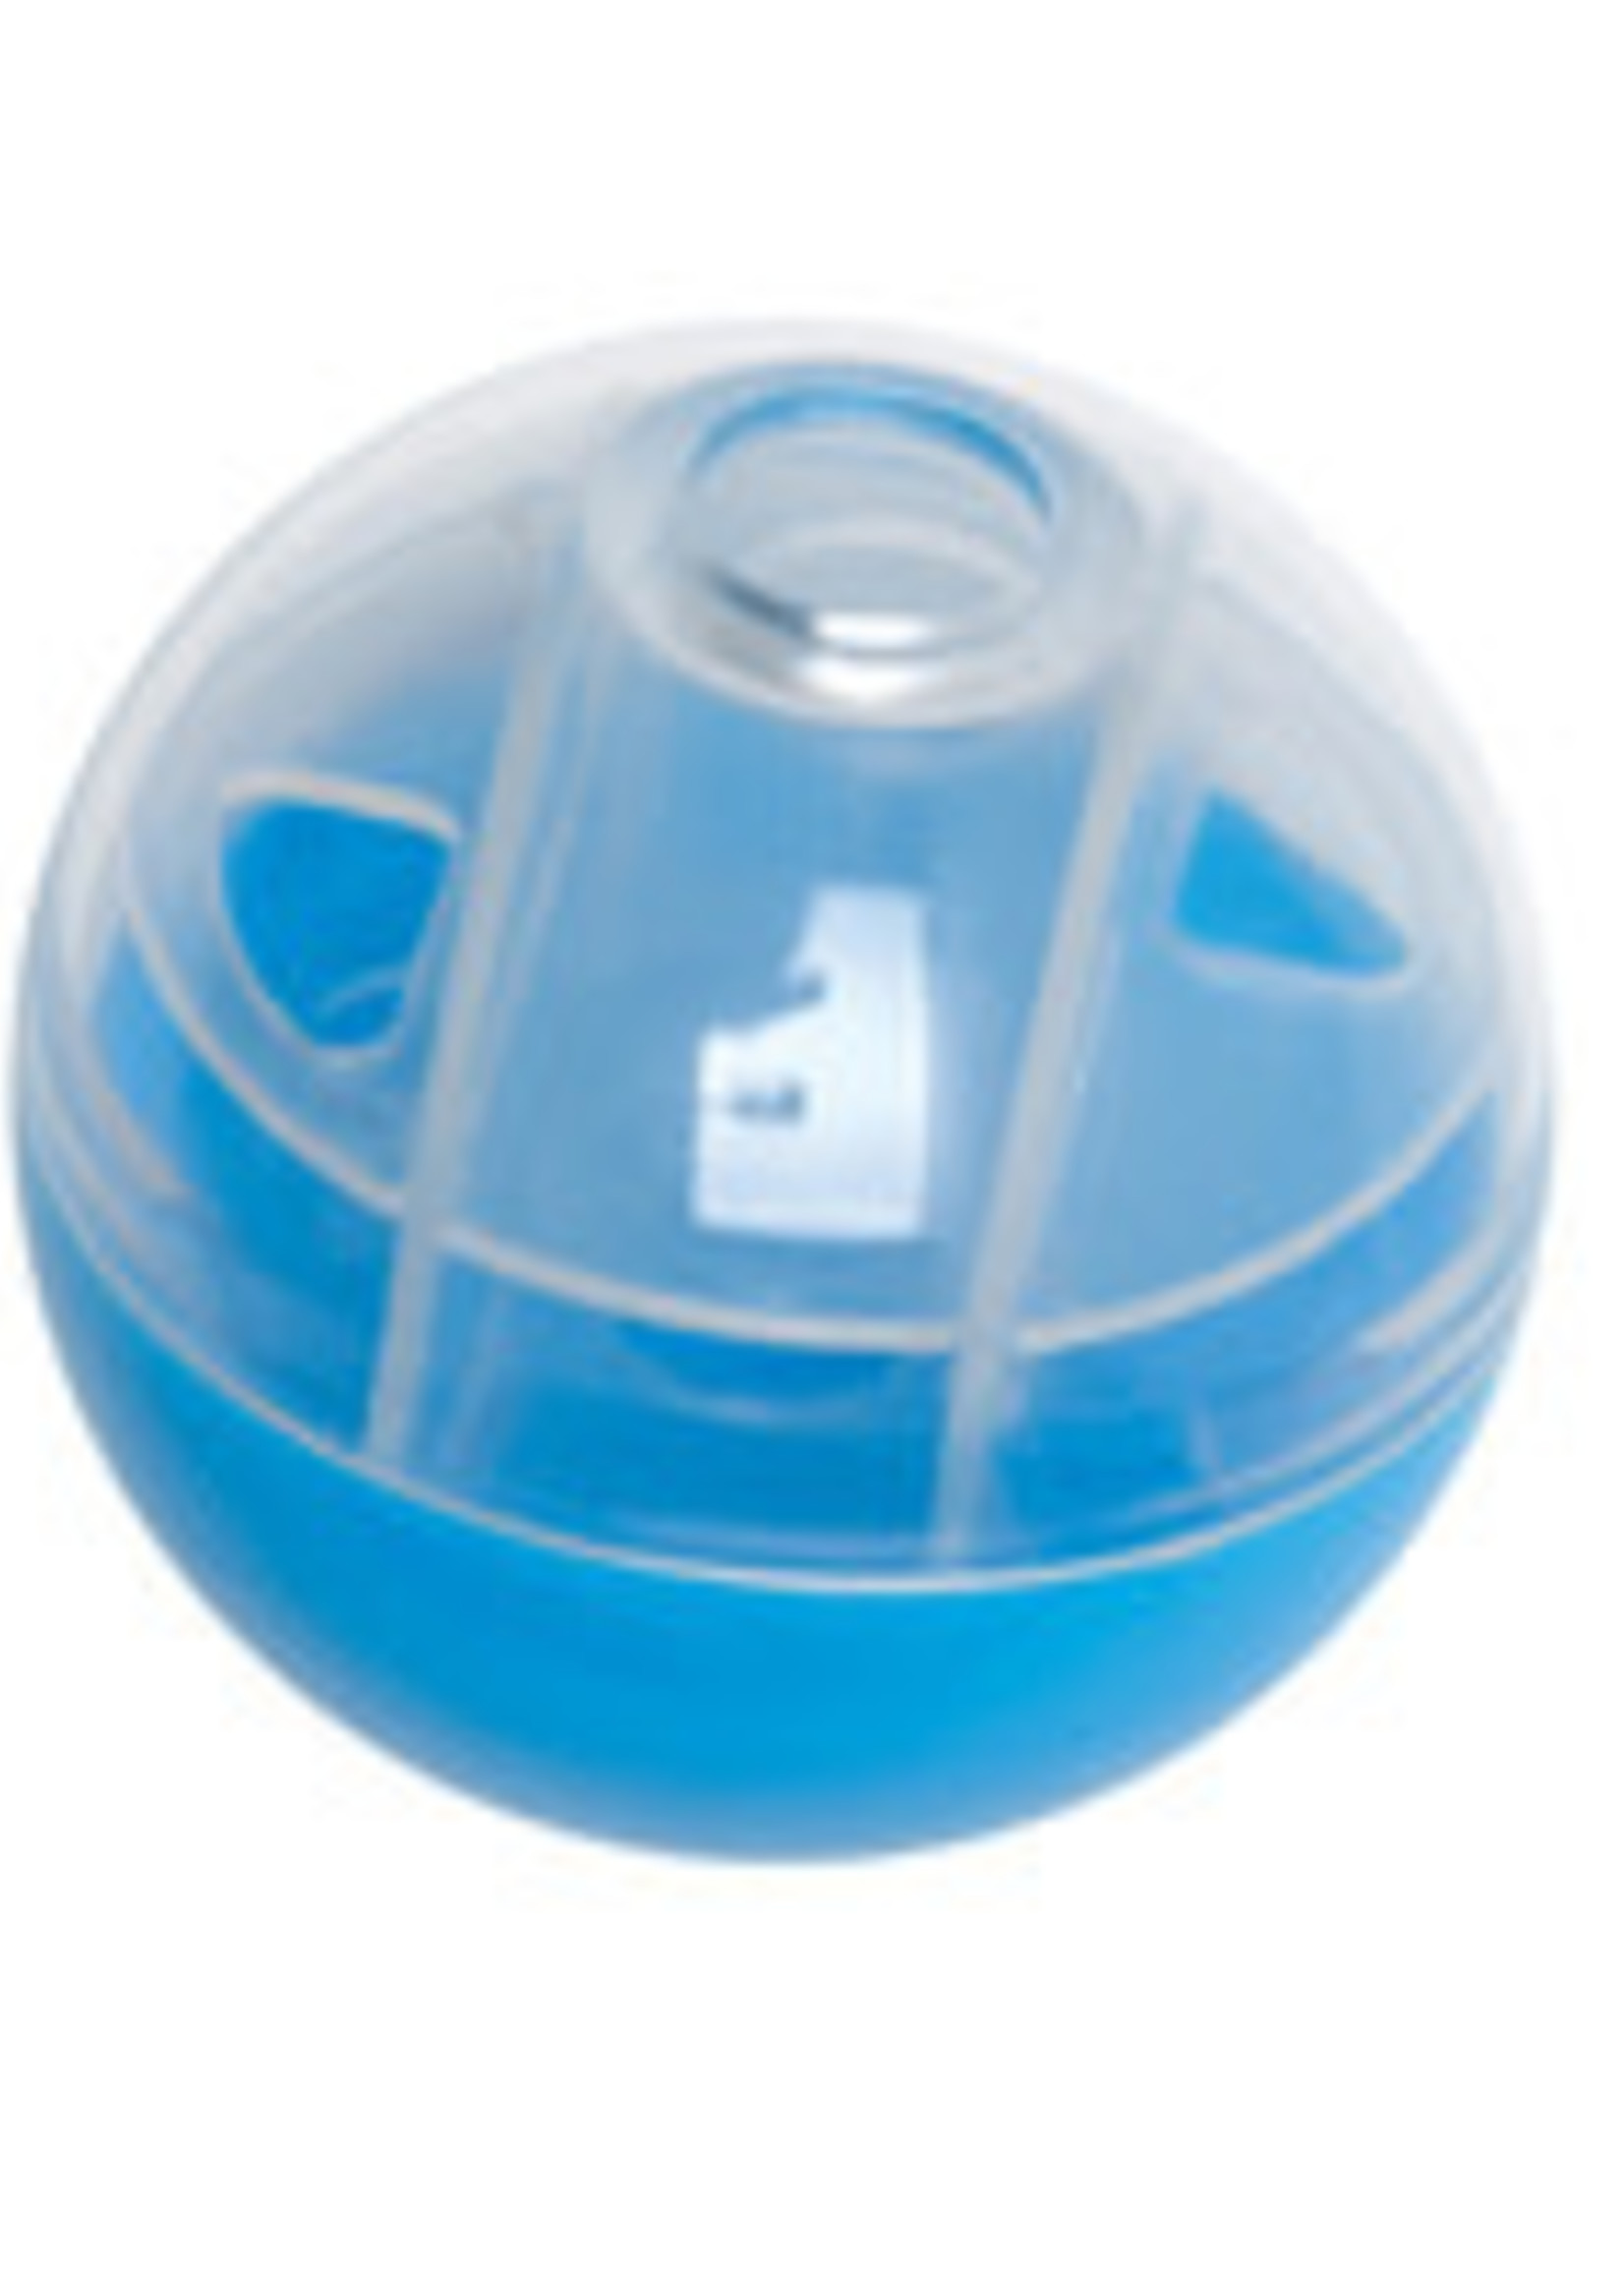 Cat Love Cat Toy - Blue Treat Ball